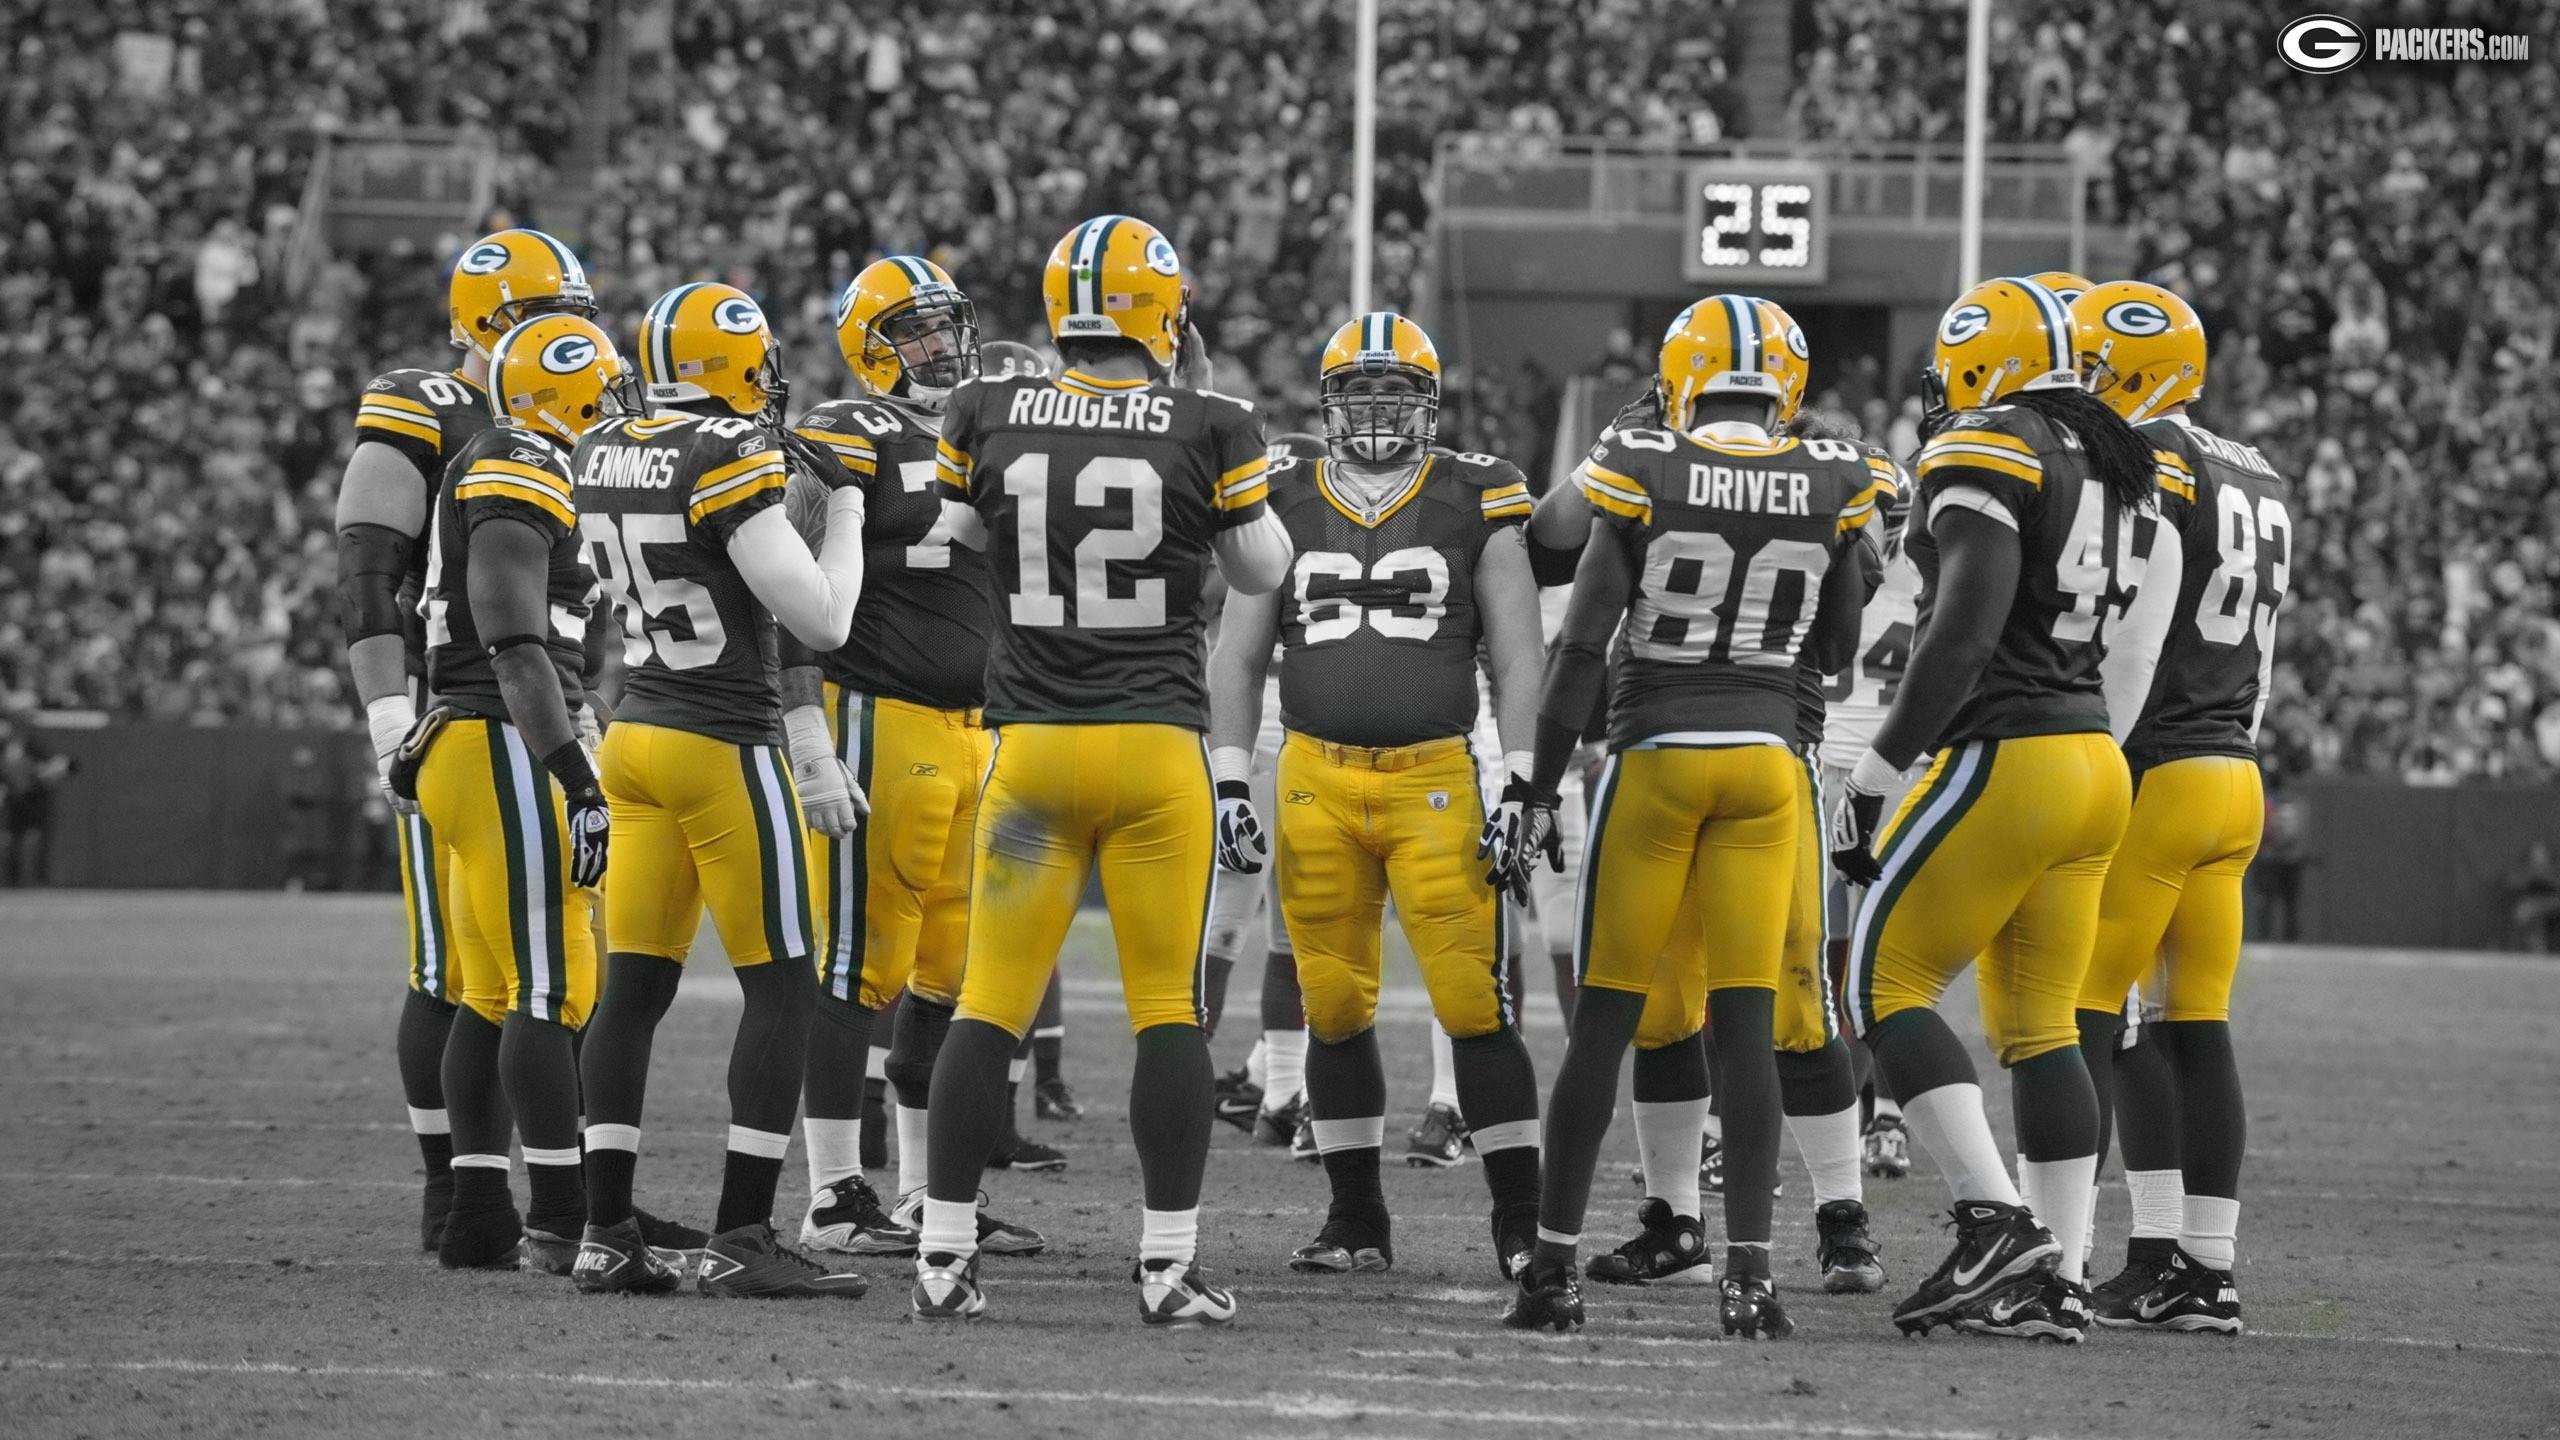 Nfl Football Team Green Bay Packers Forum Community 770307 2560×1440